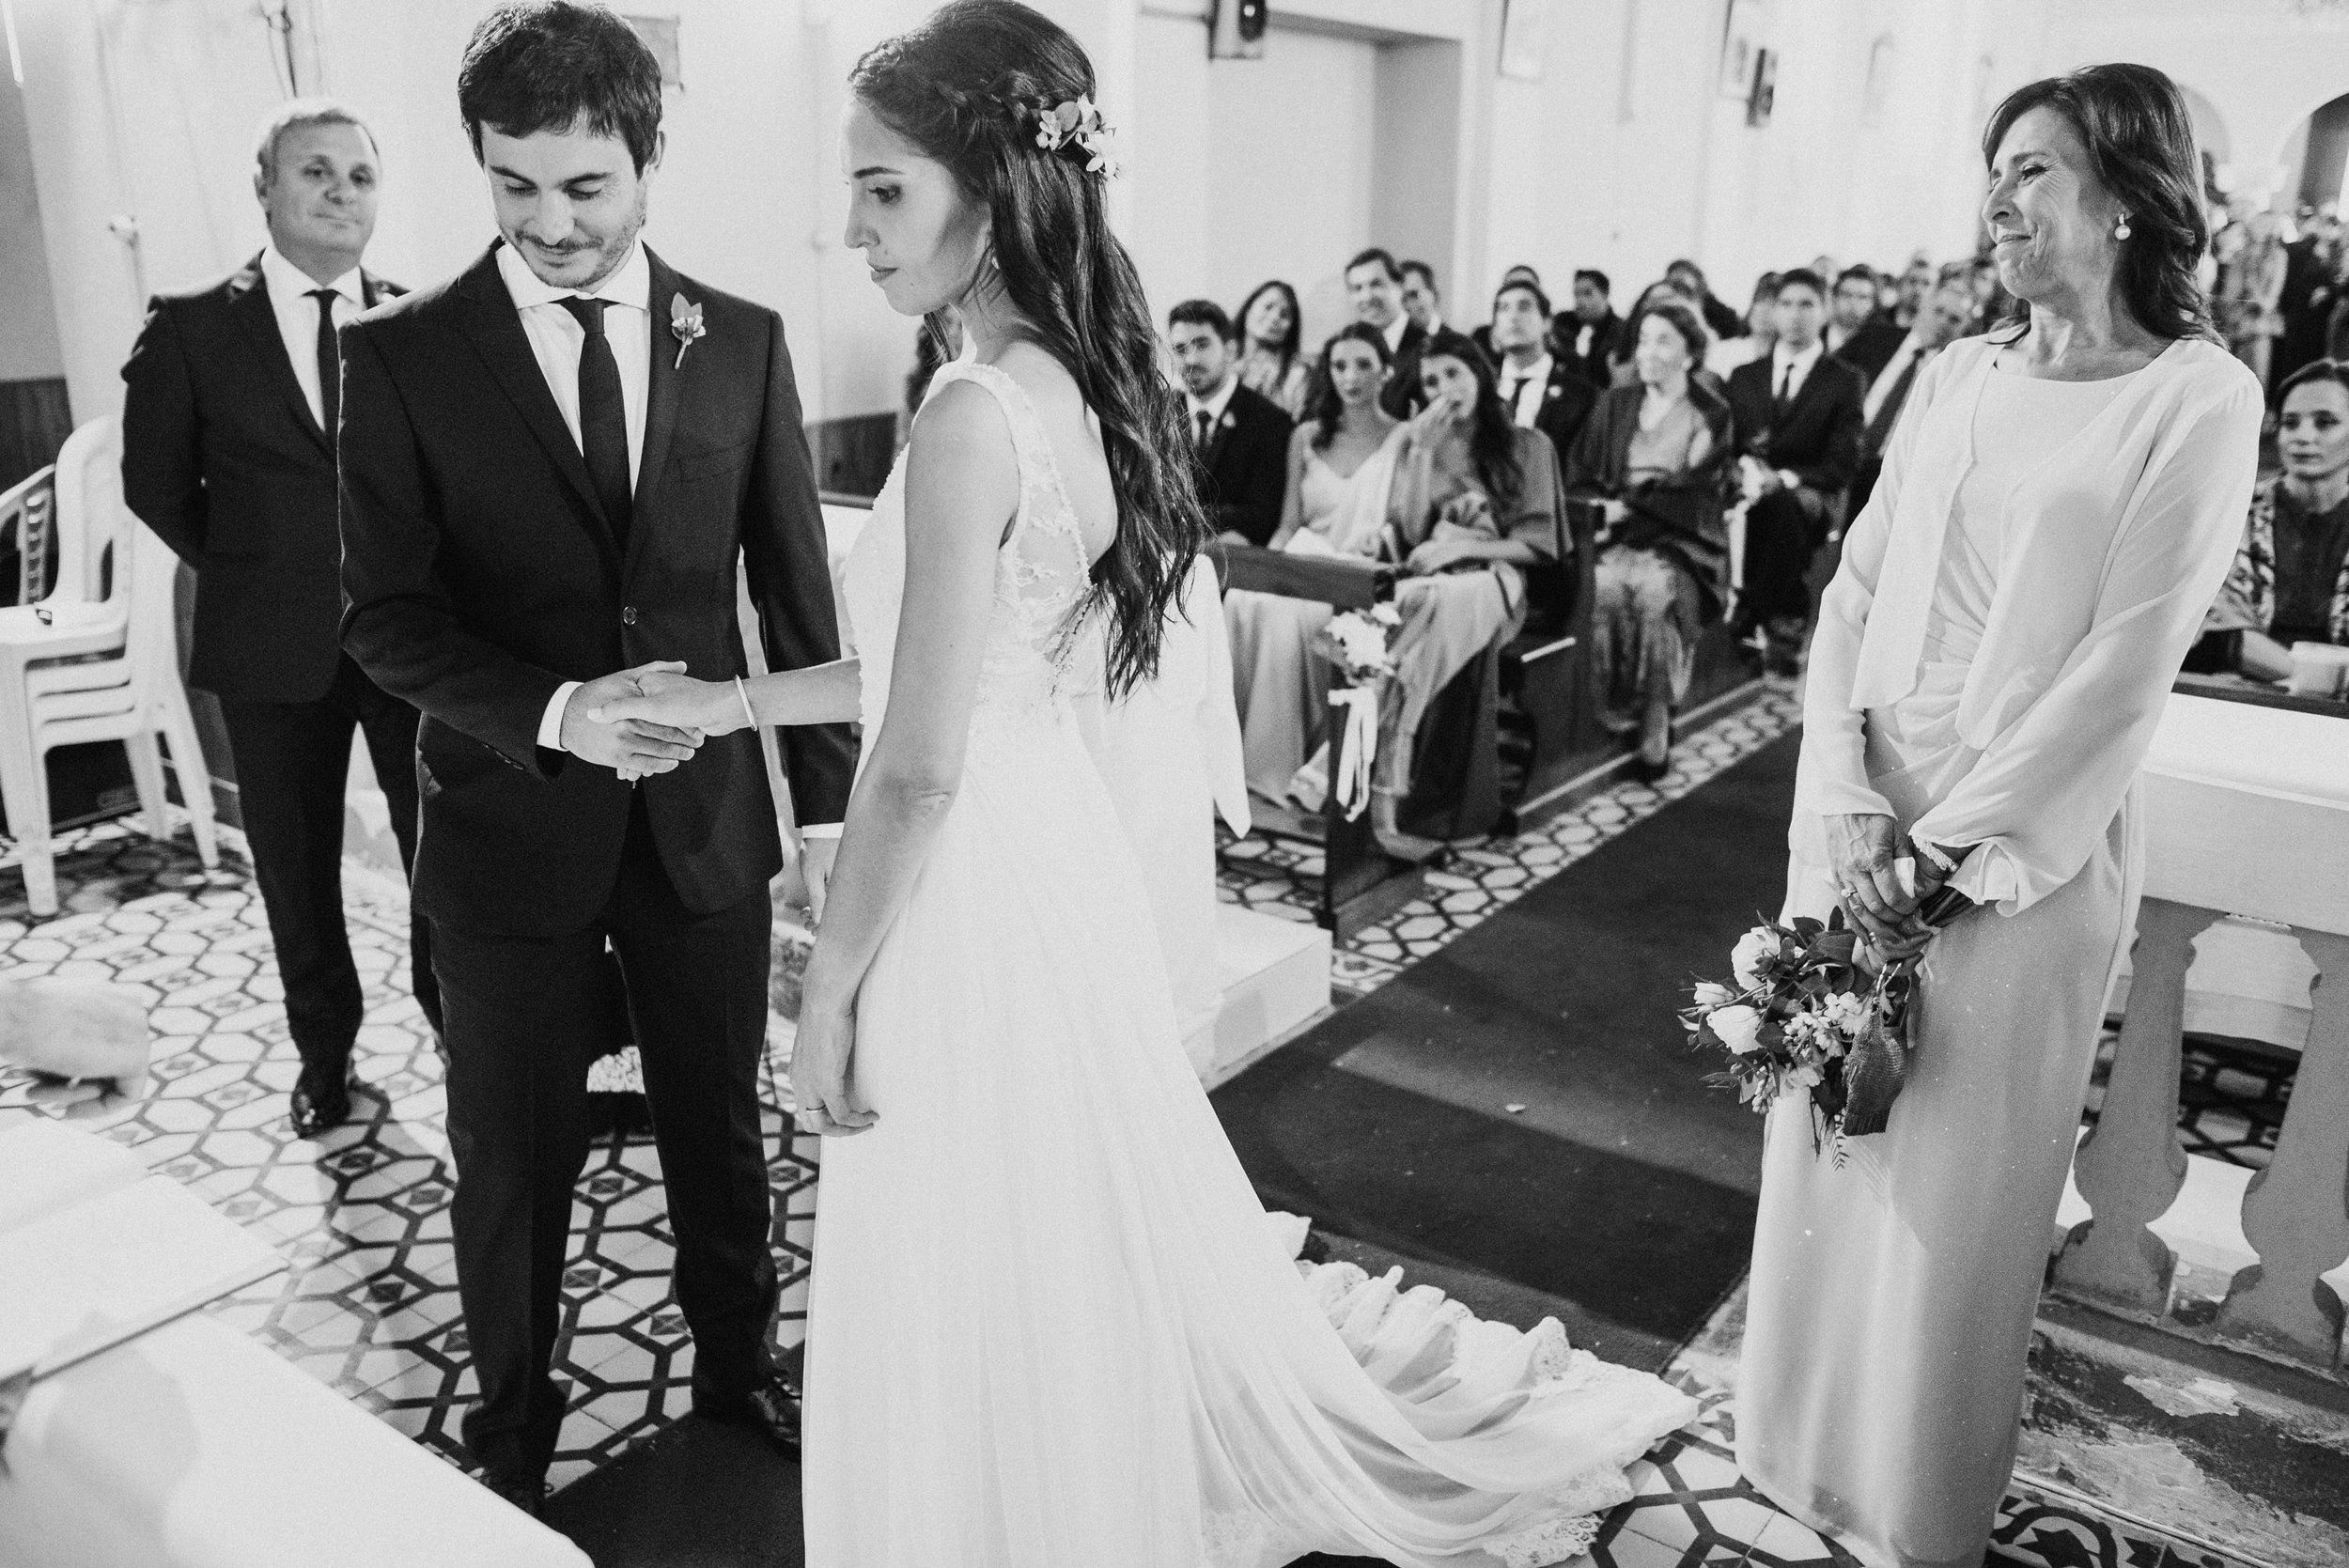 fotografo de bodas en carlos paz cordoba 027.JPG